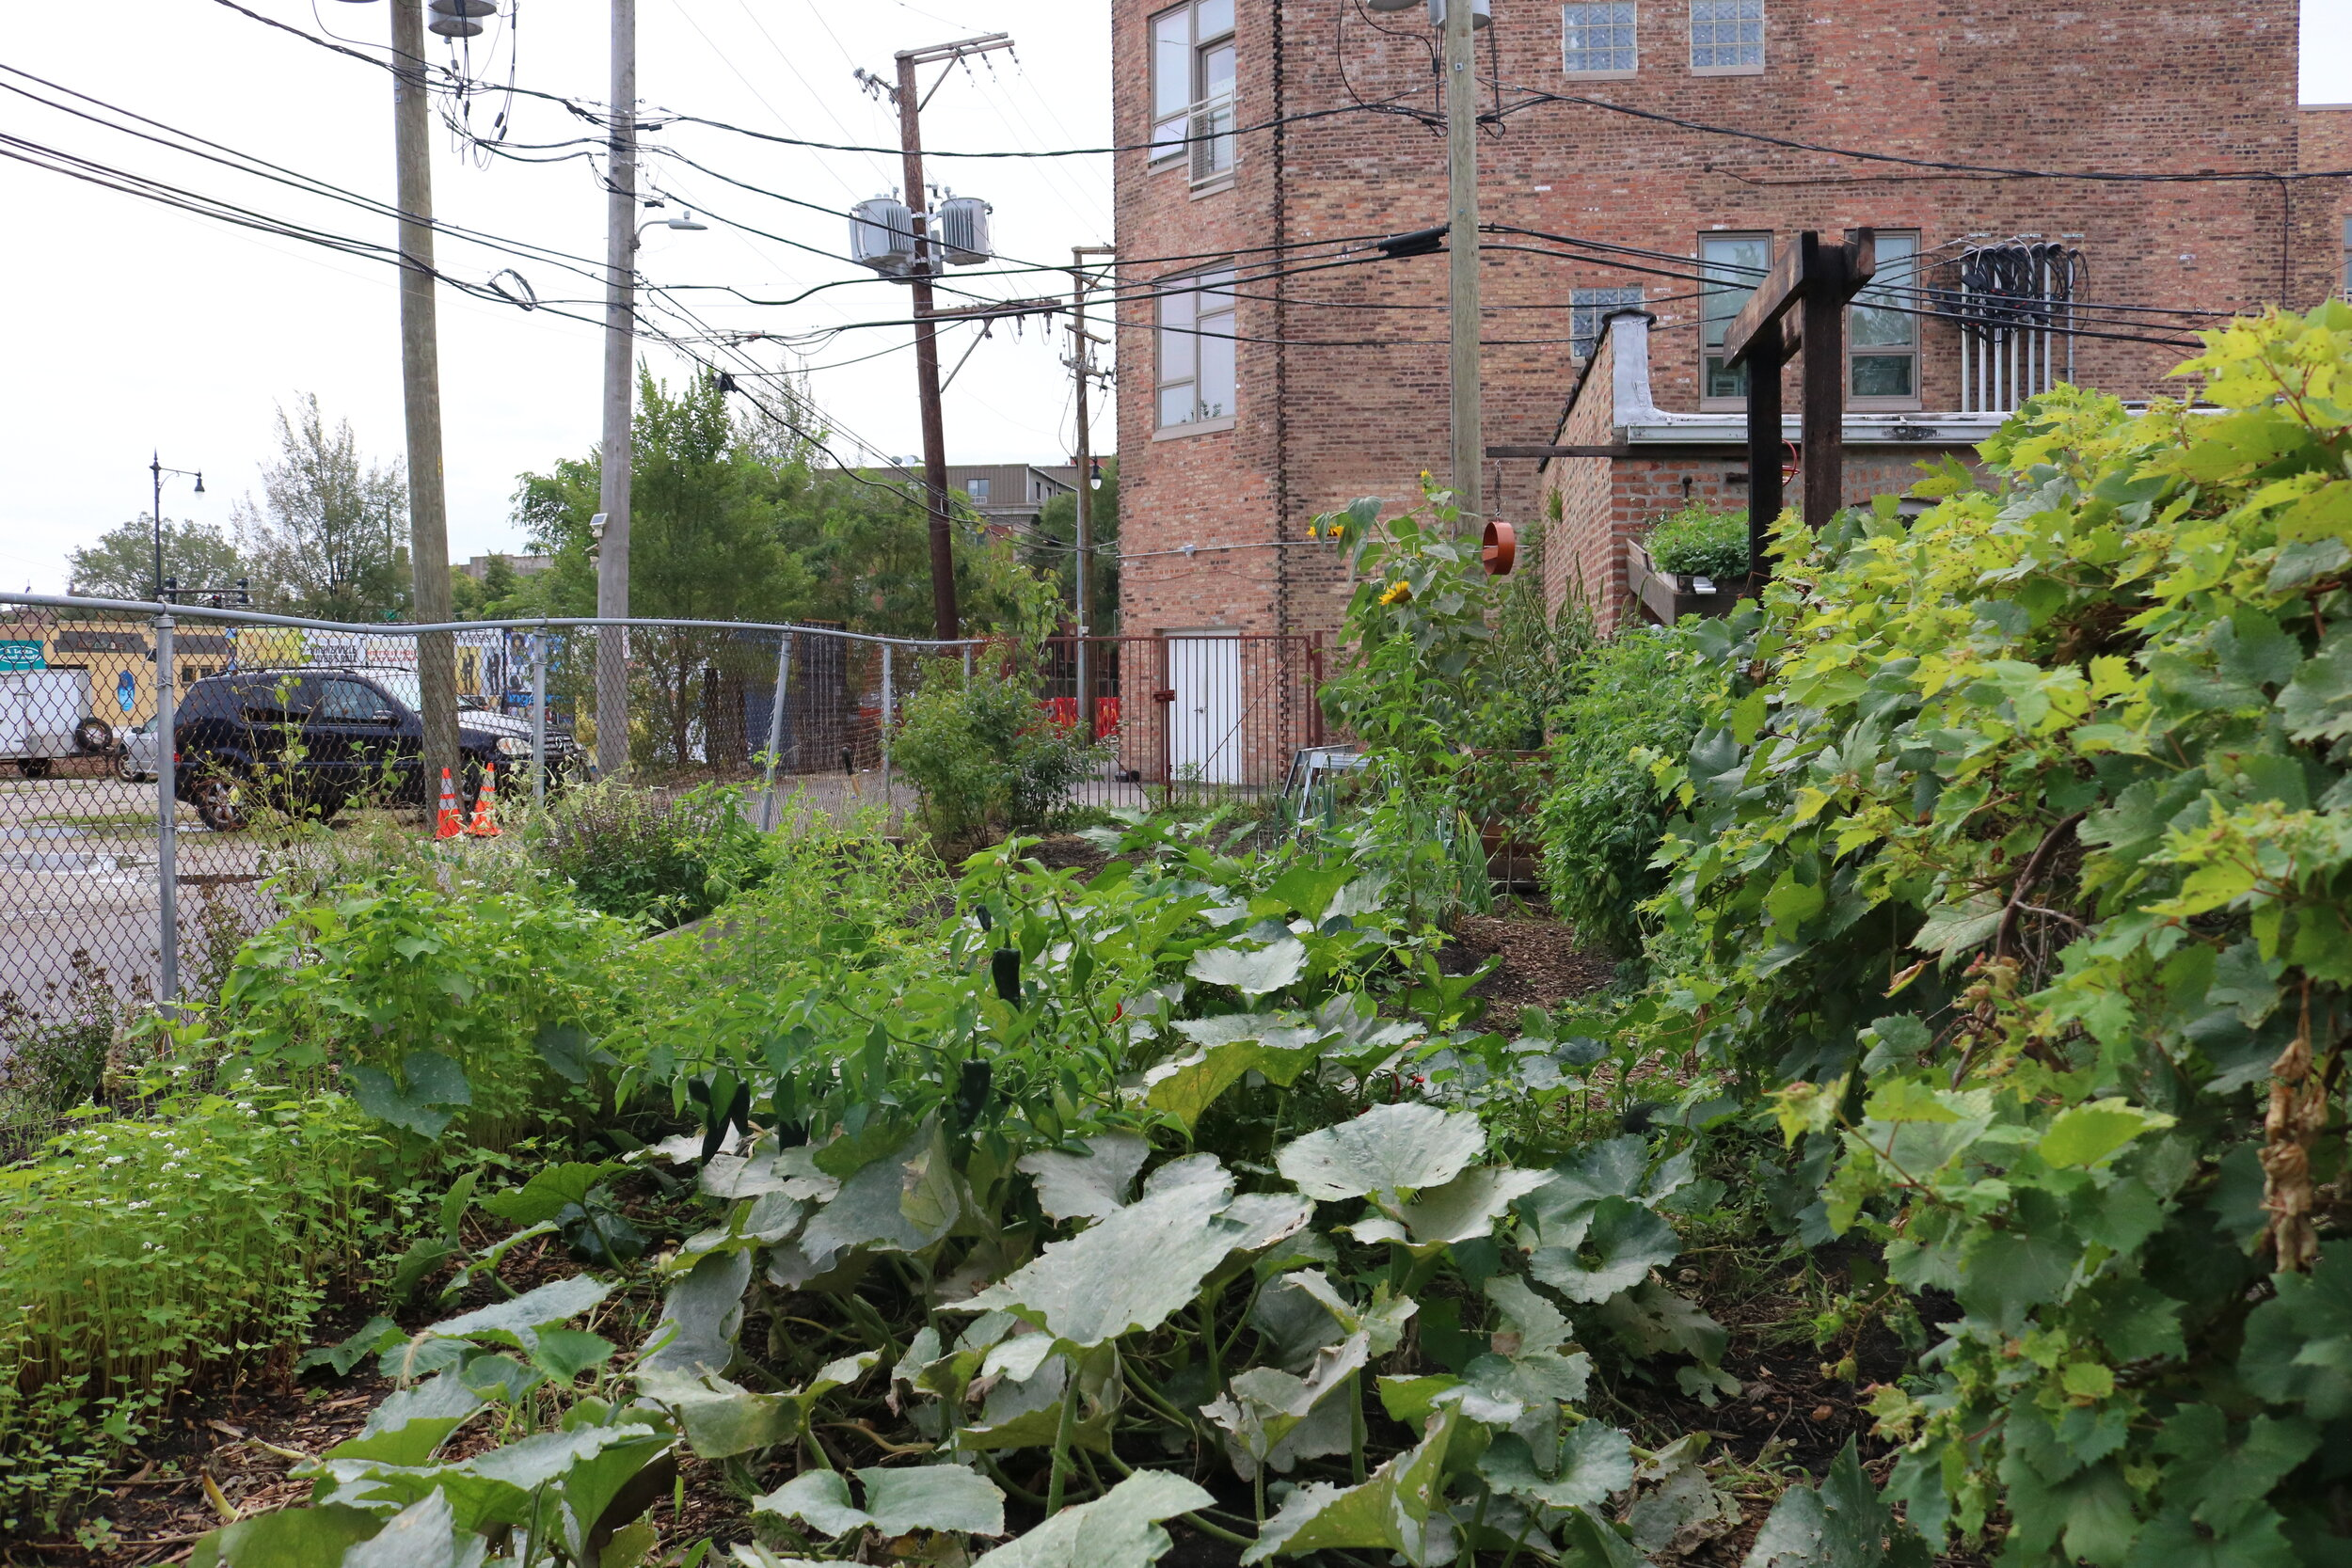 Chicagoan James Silvestro's backyard garden in the Bronzeville neighborhood.